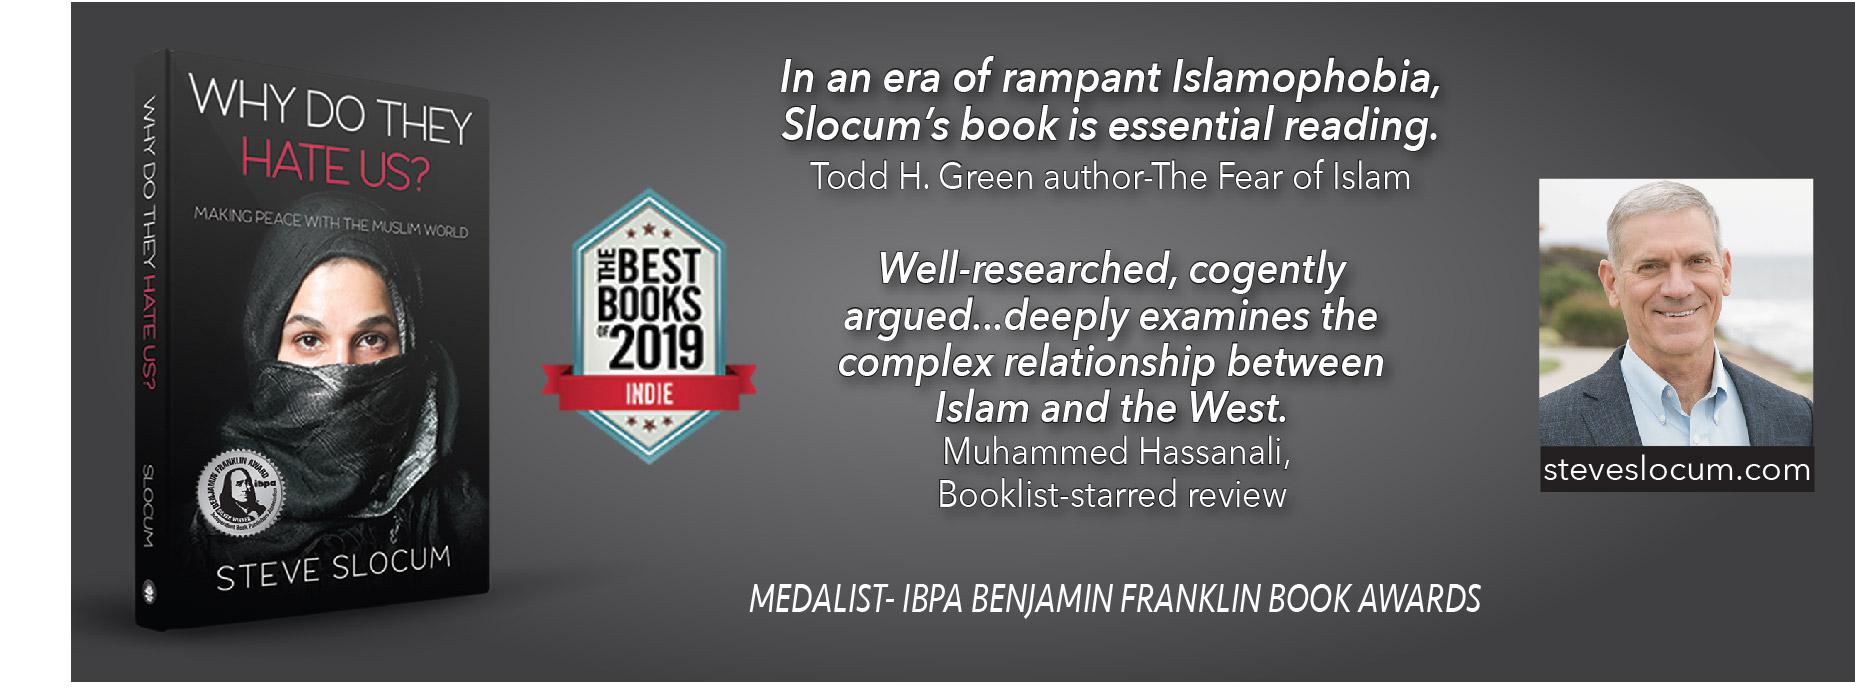 Steve Slocum, Why Do They Hate Us?, Hate Crimes, Islamophobia